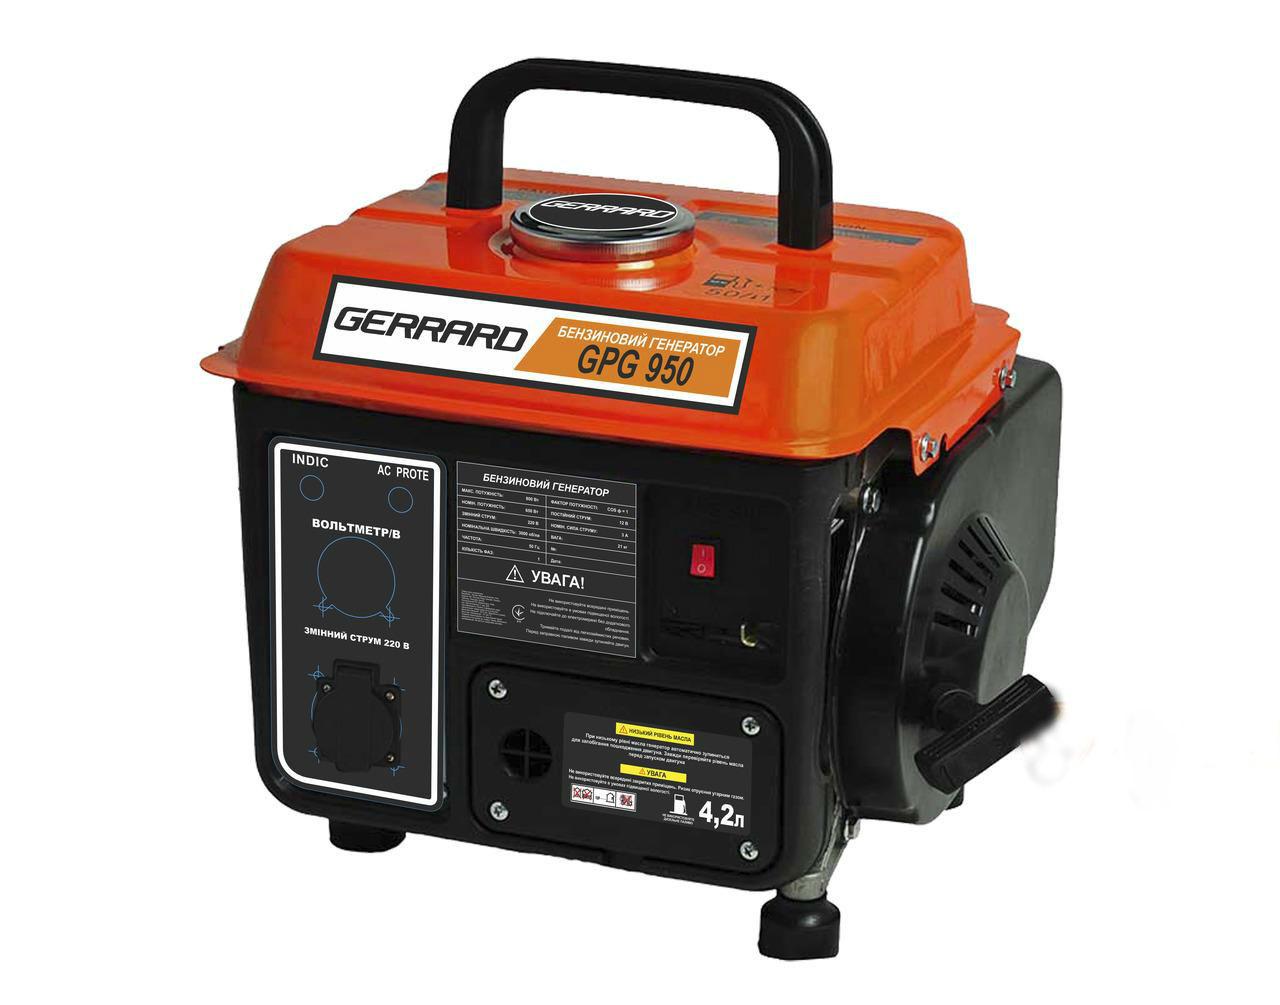 Gerrard GPG950 Электрогенератор